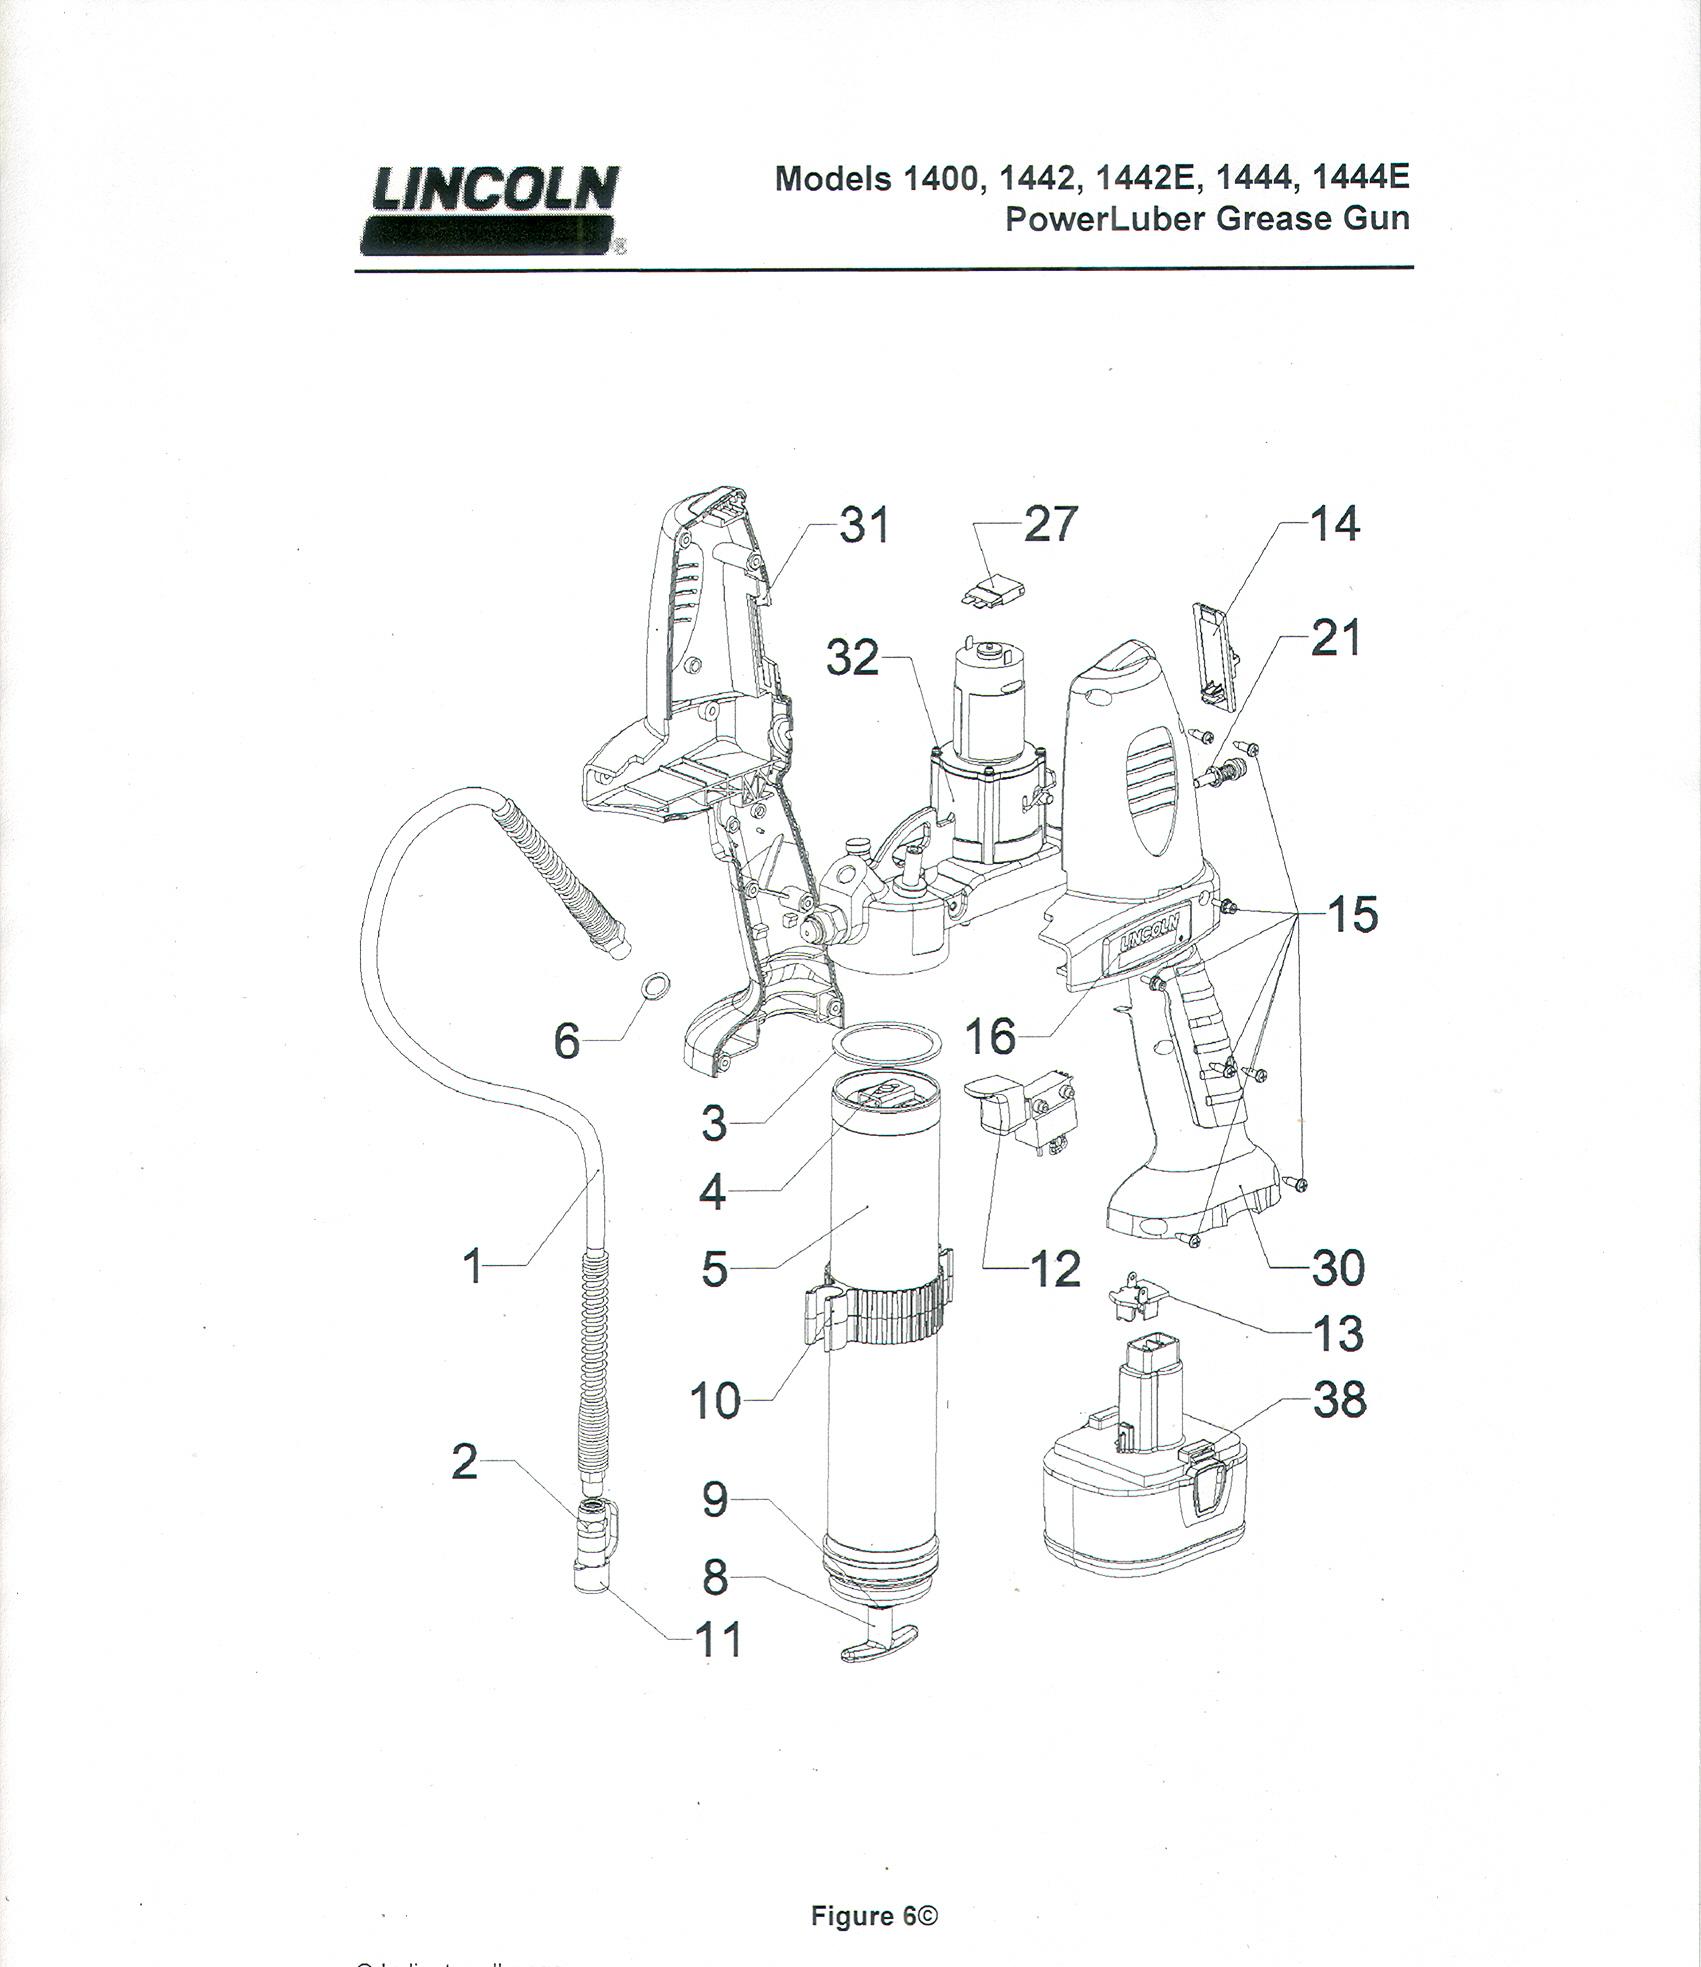 2008 Toyota Rav4 2 4 Engine Diagram Automotive Wiring 2006 Highlander Library Rh 26 Dirtytalk Camgirls De Parts Rav